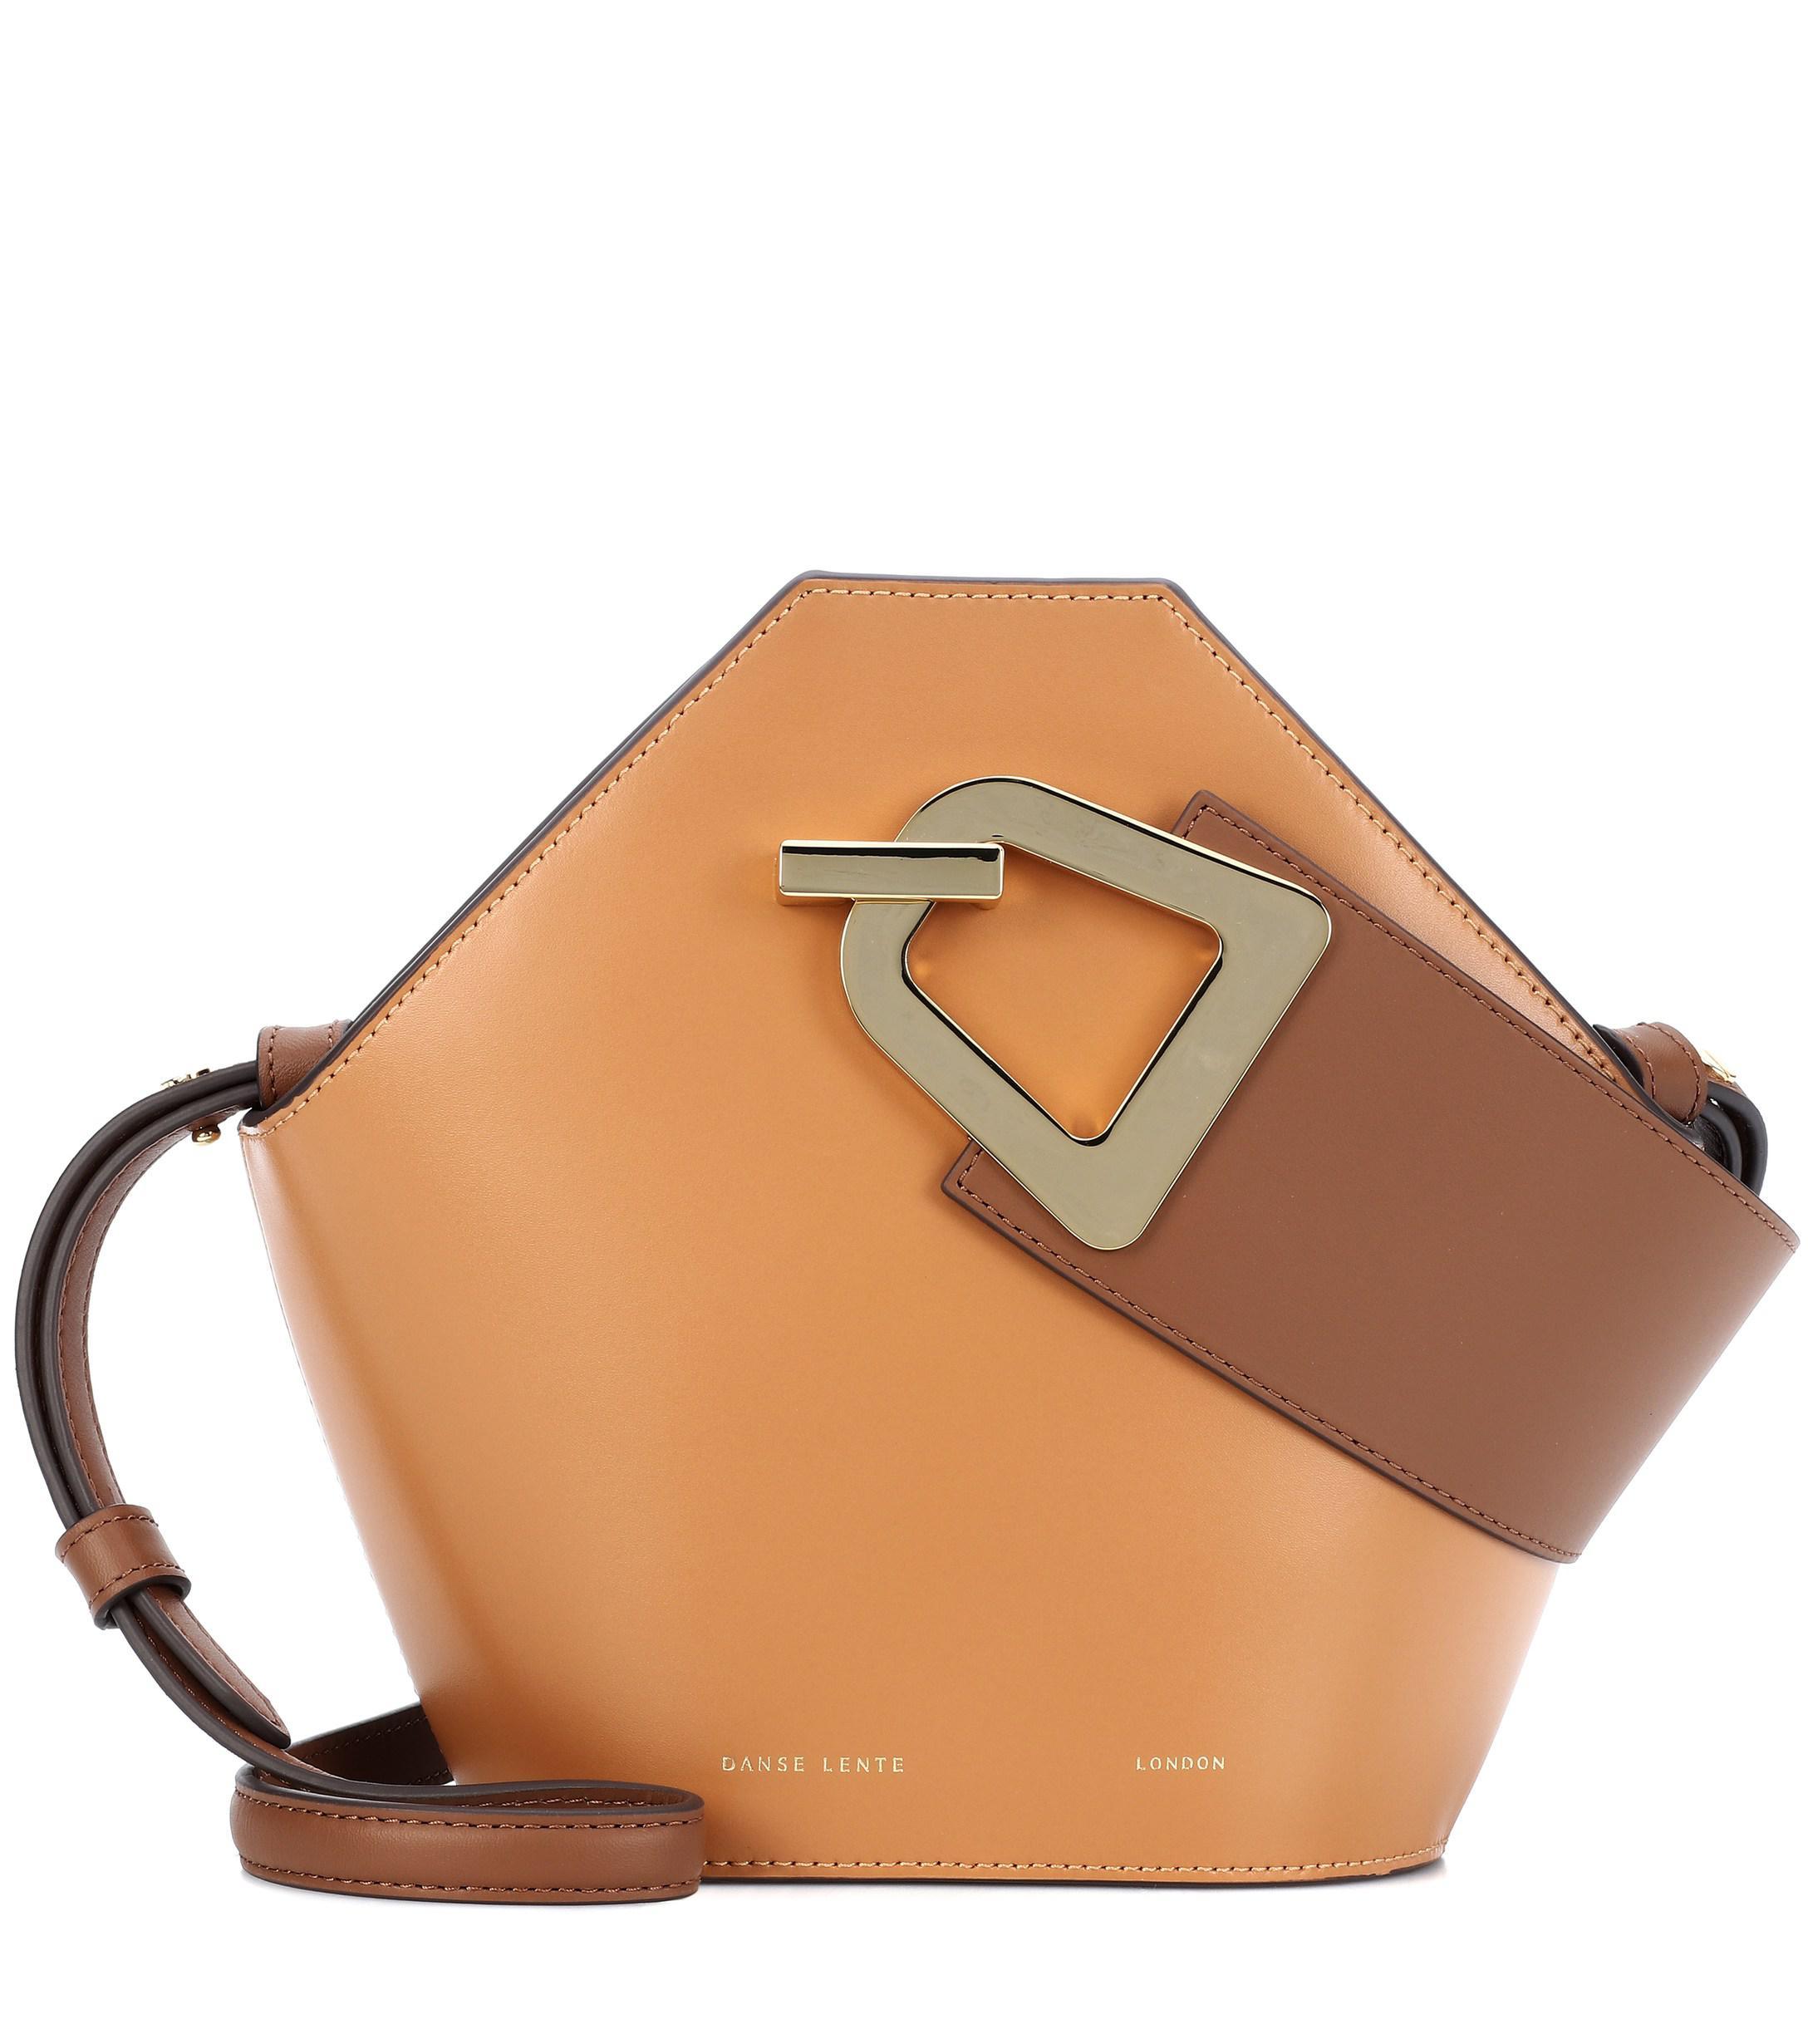 091bbb5b518d Danse Lente - Brown Mini Johnny Leather Bucket Bag - Lyst. View fullscreen